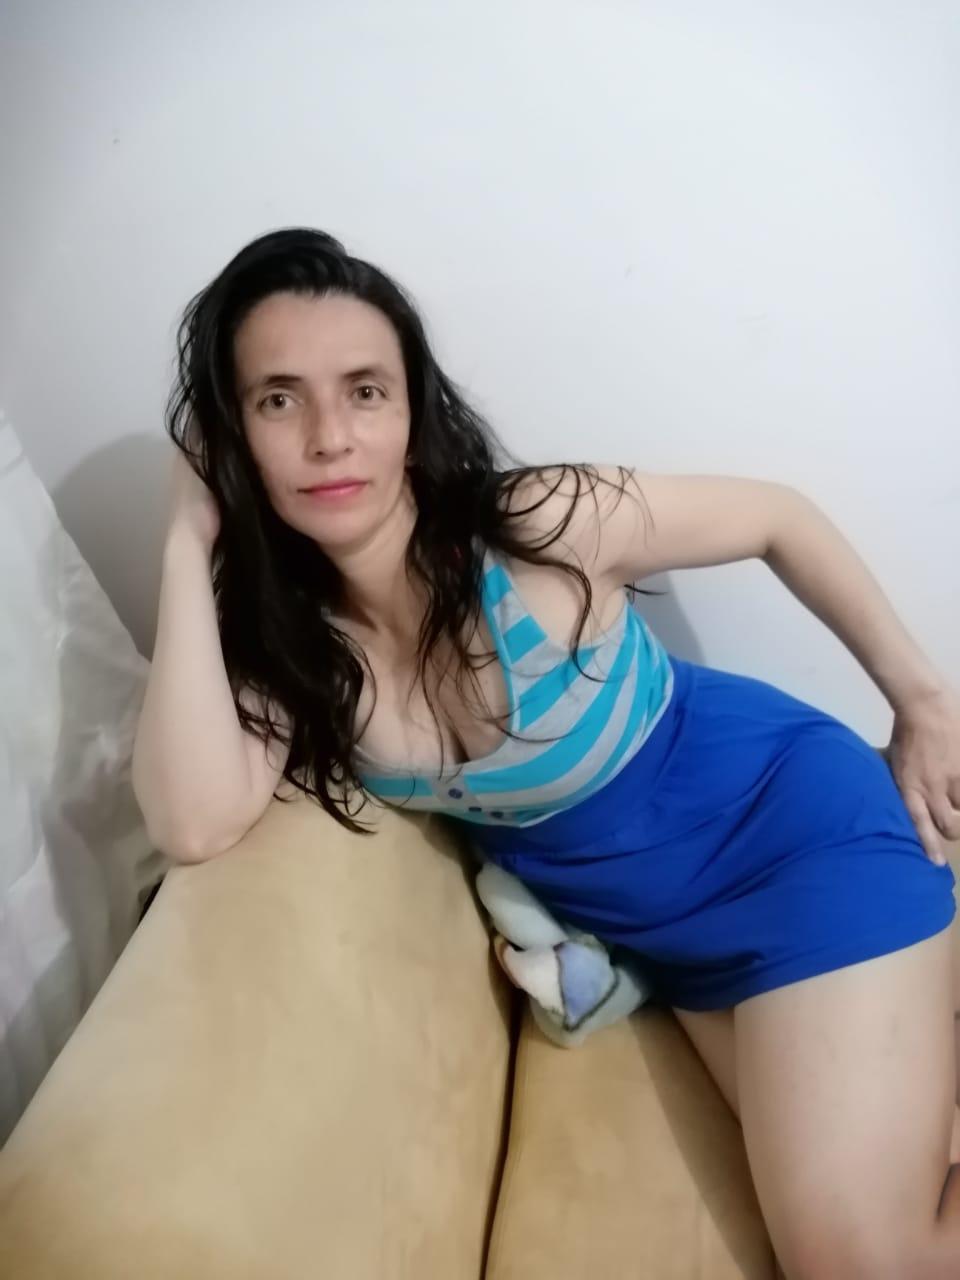 Sexycreazy?s=qjuggqgm0dqhkfacpjhhkivqybh1h3s62lddb75o6ks=